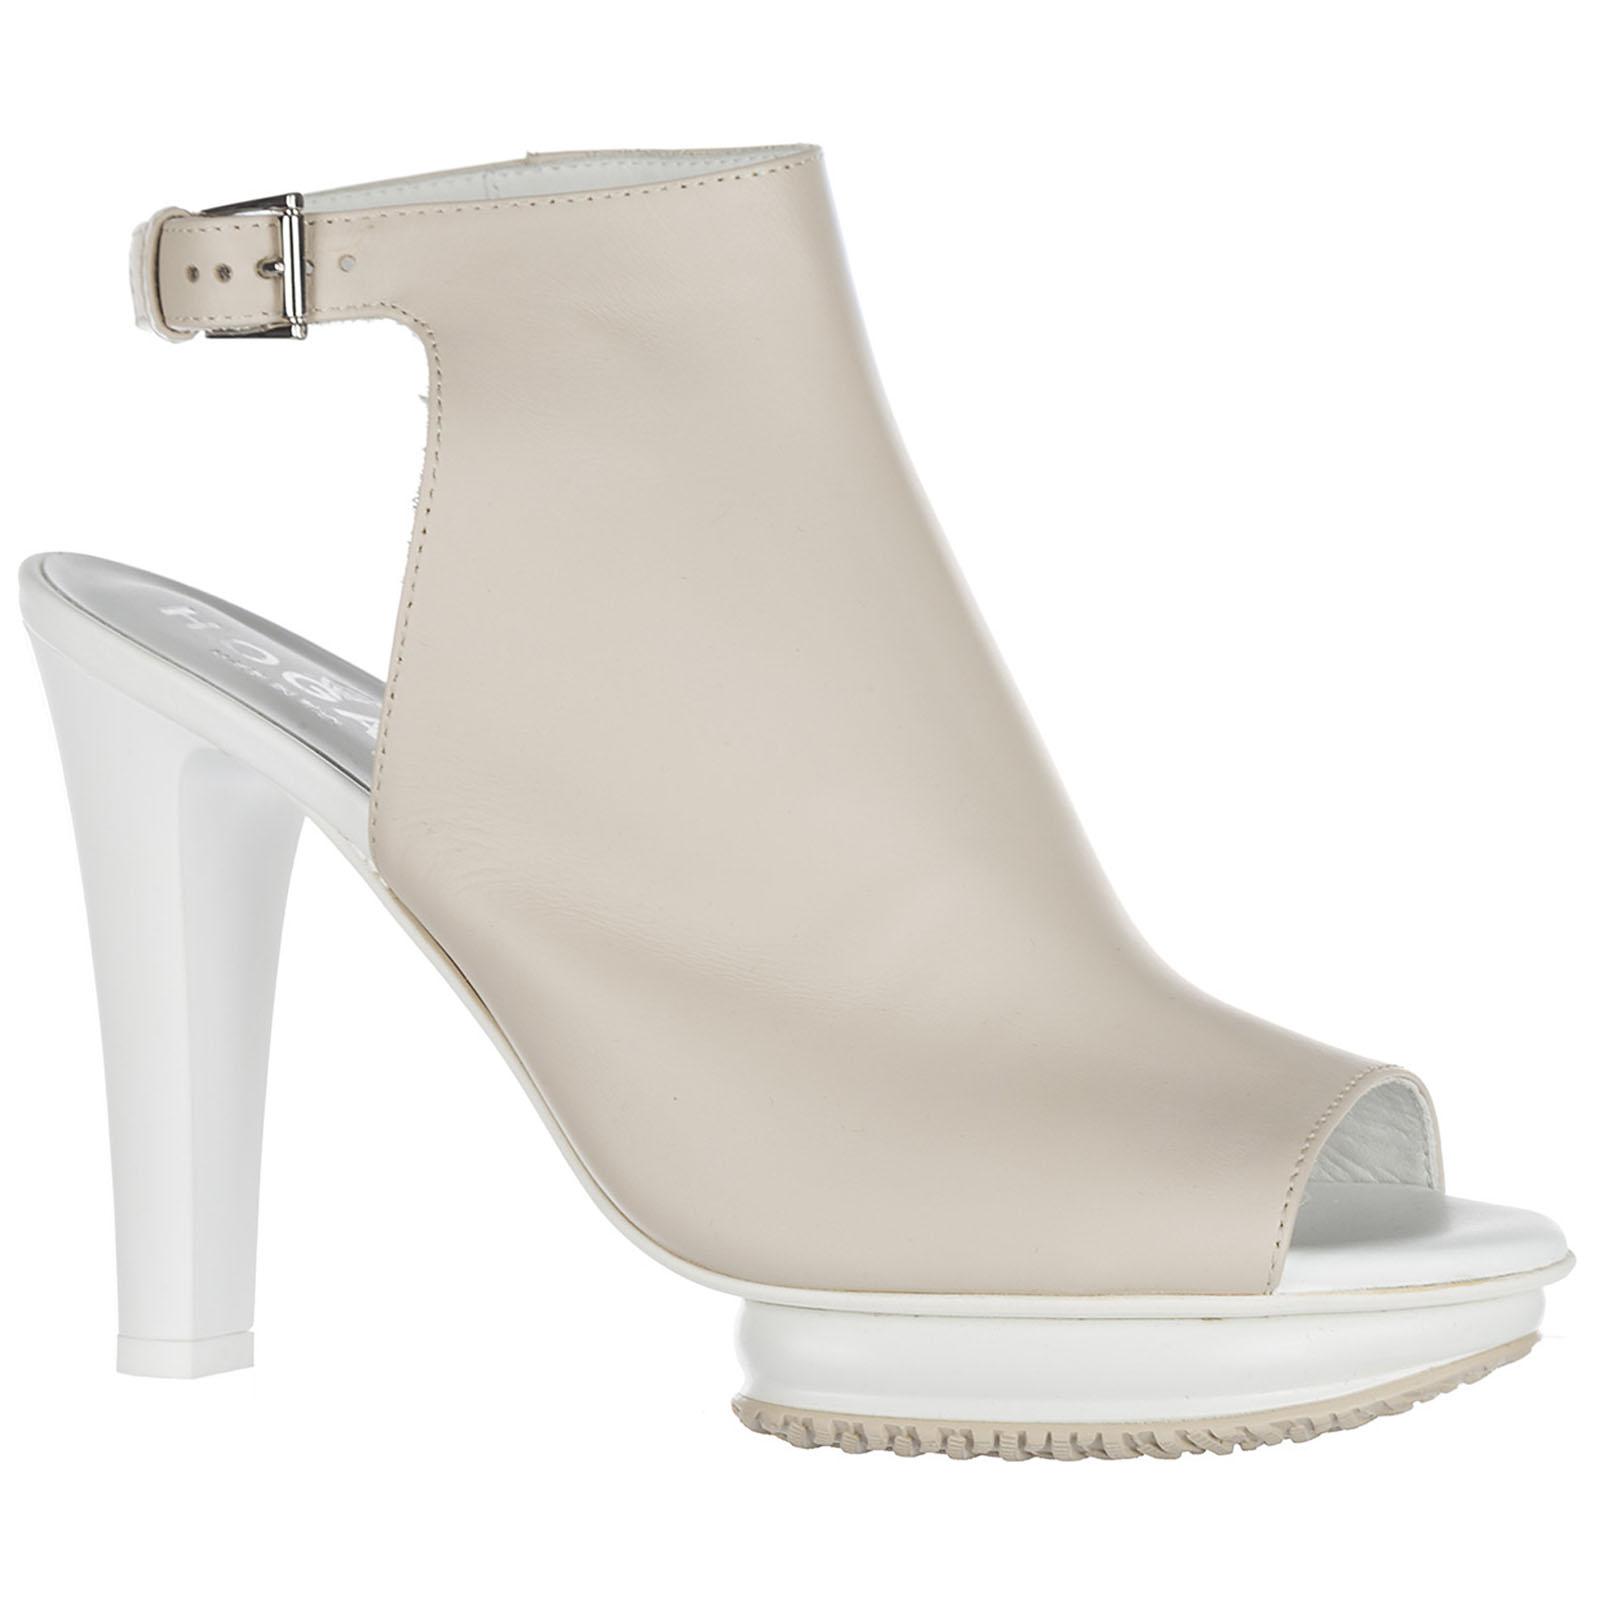 Damen leder sandalen mit absatz sandaletten Damen leder sandalen mit absatz  sandaletten ... a67dae14f1